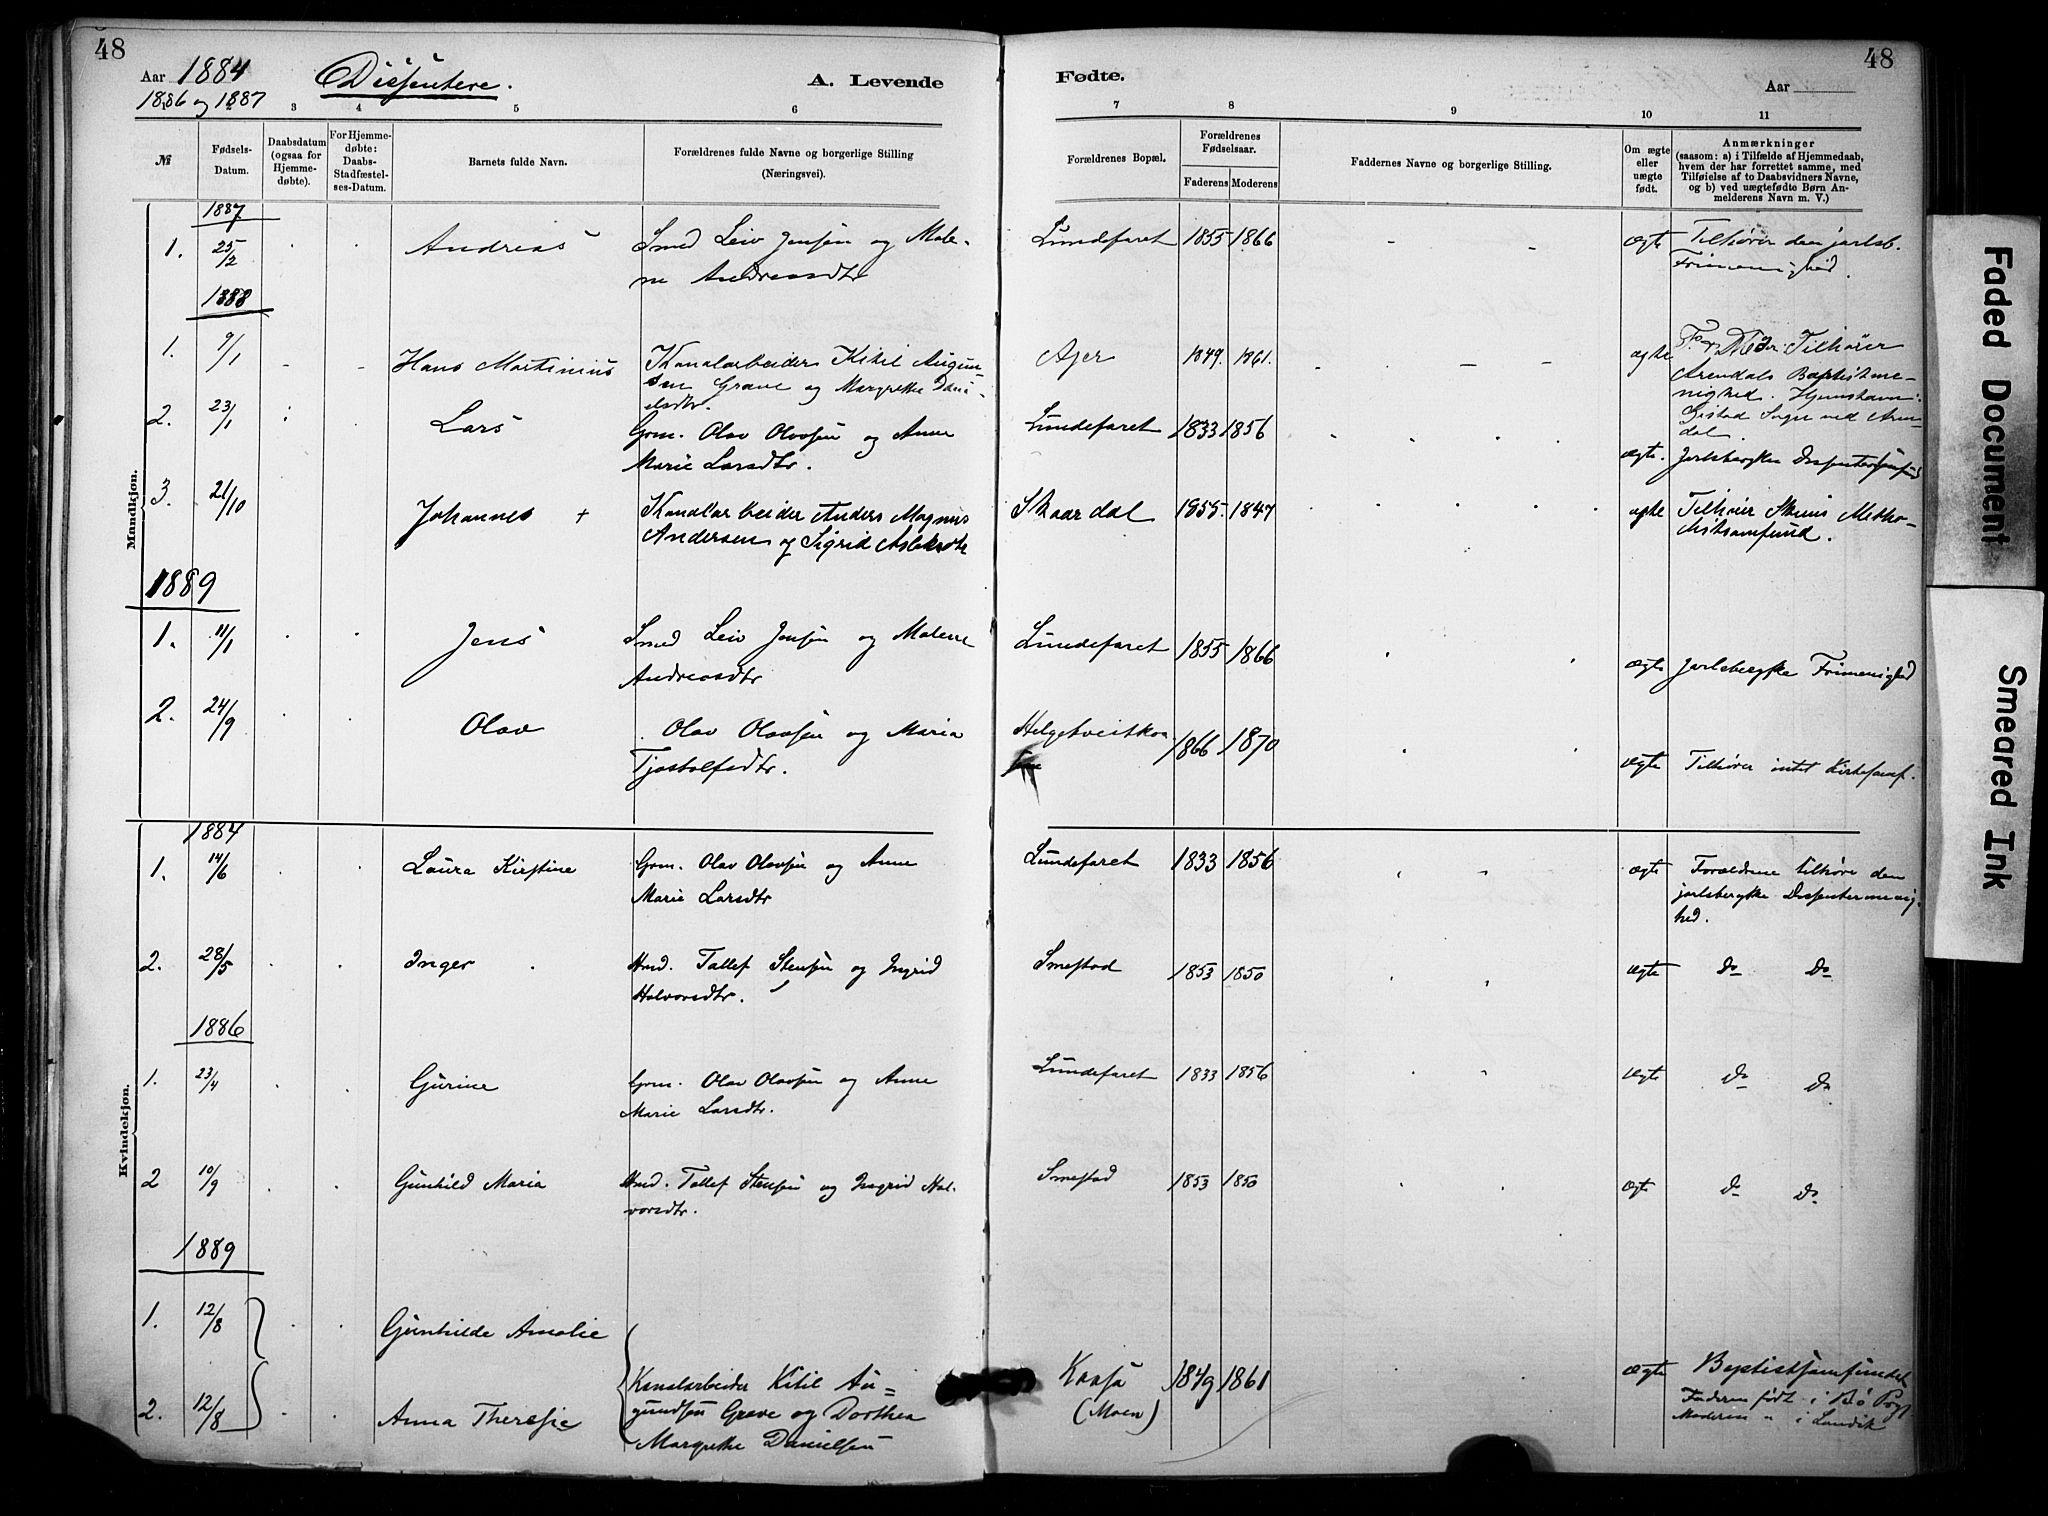 SAKO, Lunde kirkebøker, F/Fa/L0002: Ministerialbok nr. I 2, 1884-1892, s. 48